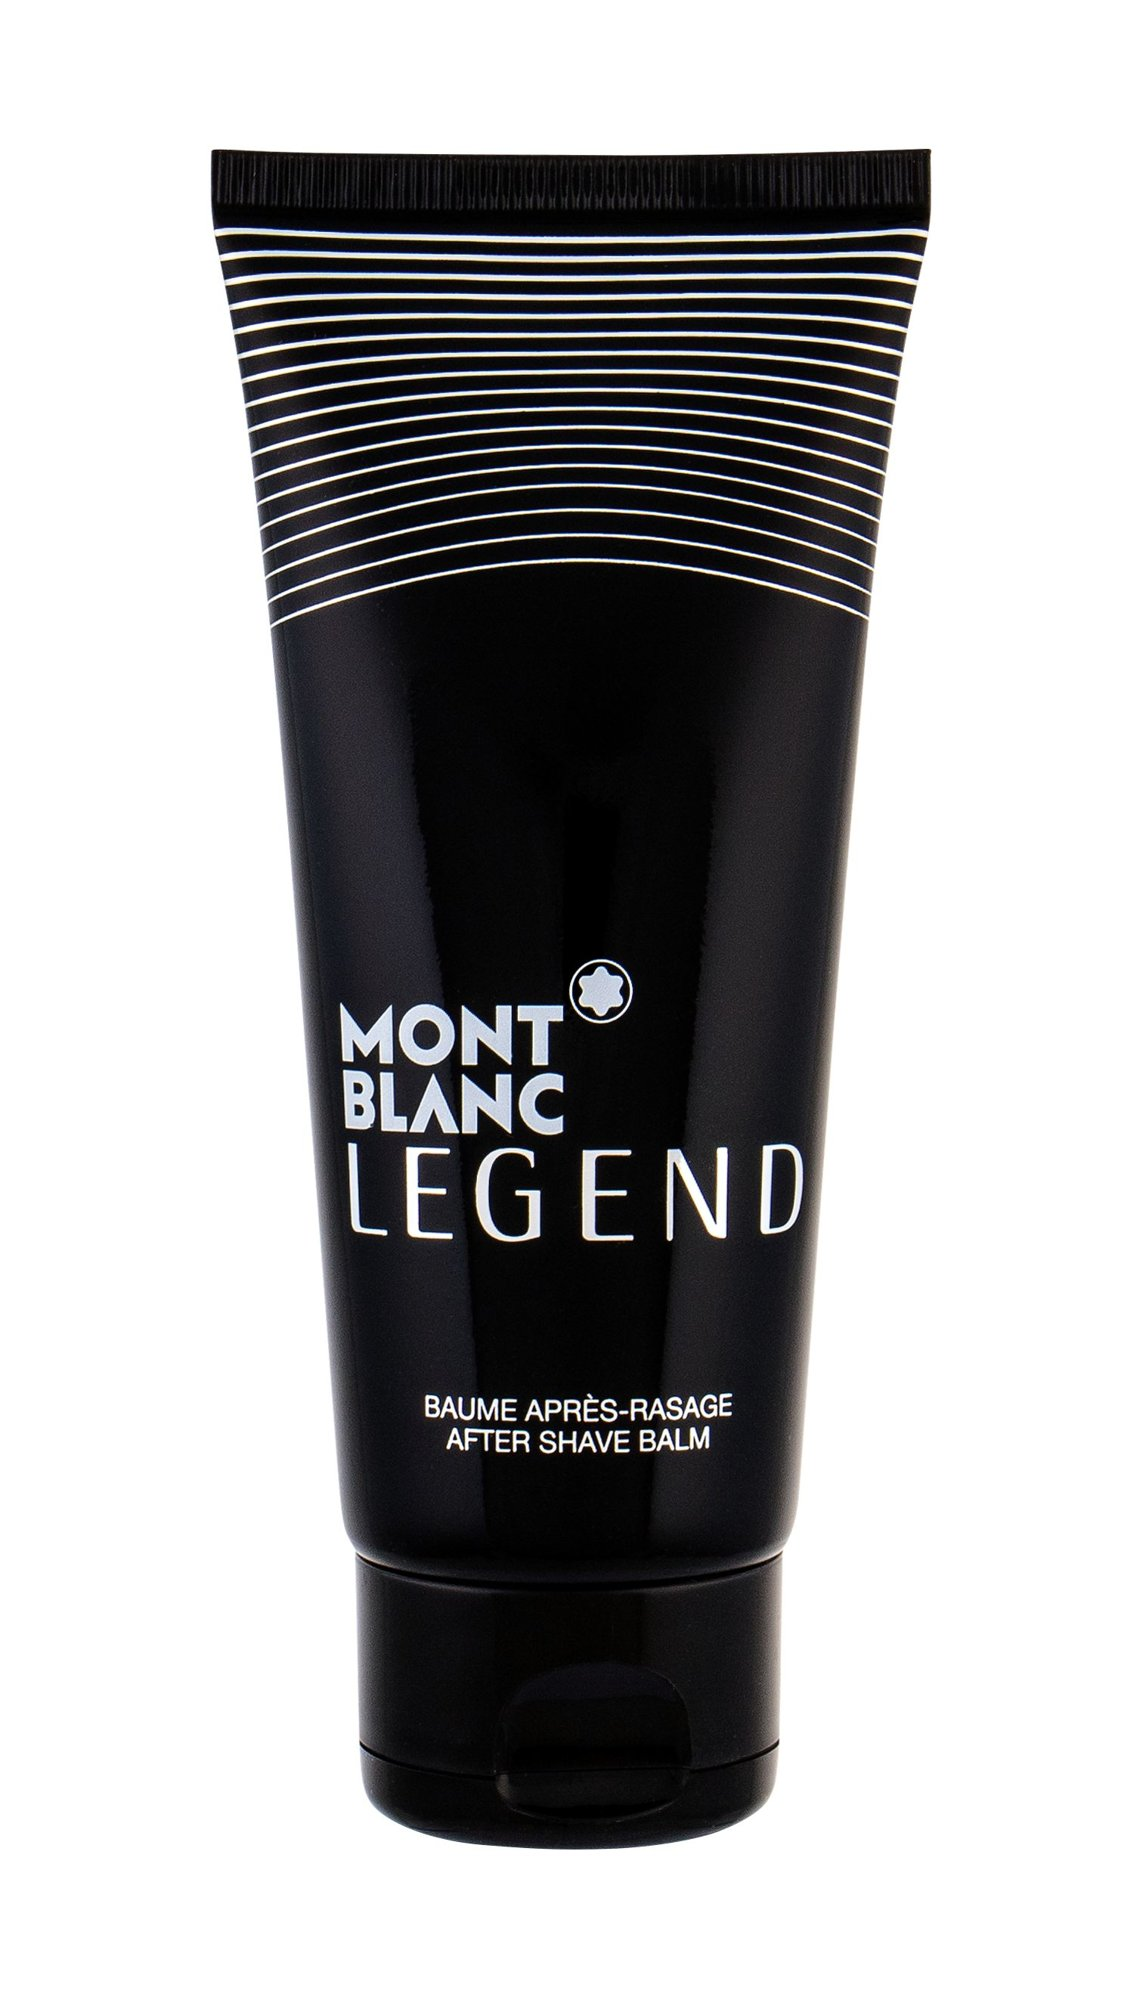 Montblanc Legend Aftershave Balm 100ml